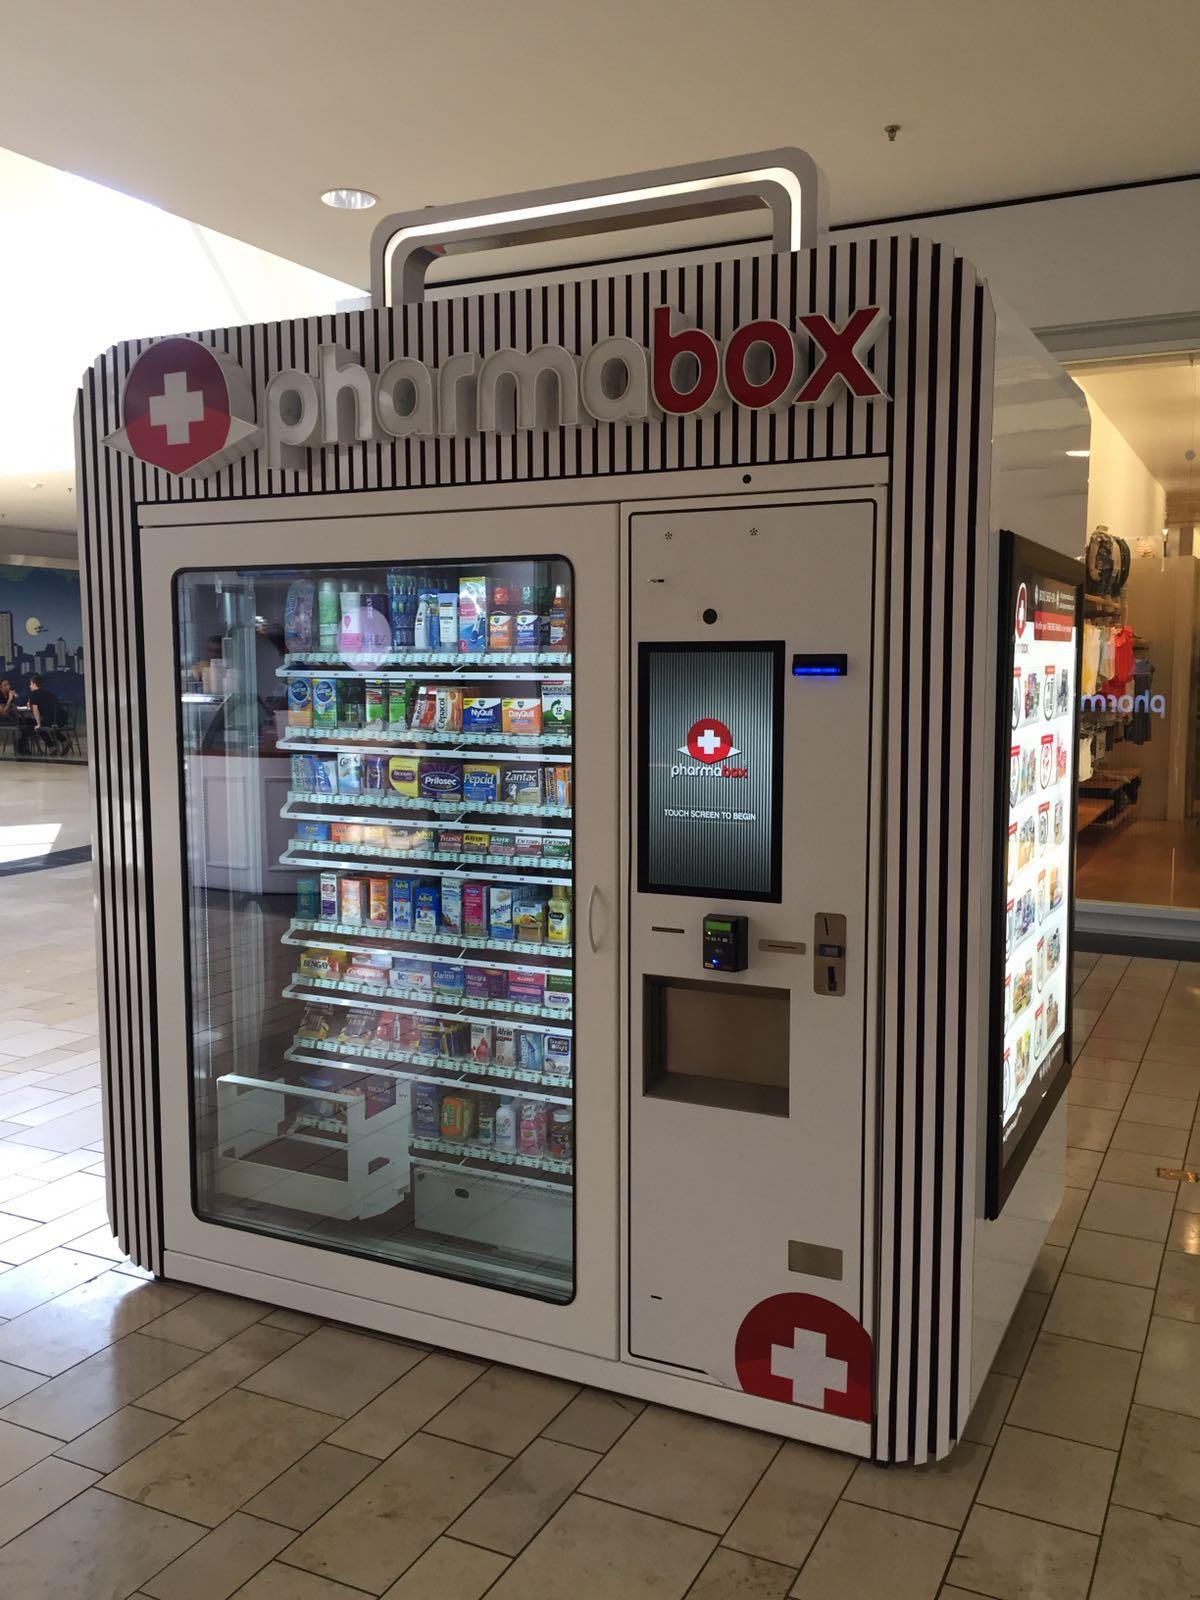 Intelligent Vending Machines Market